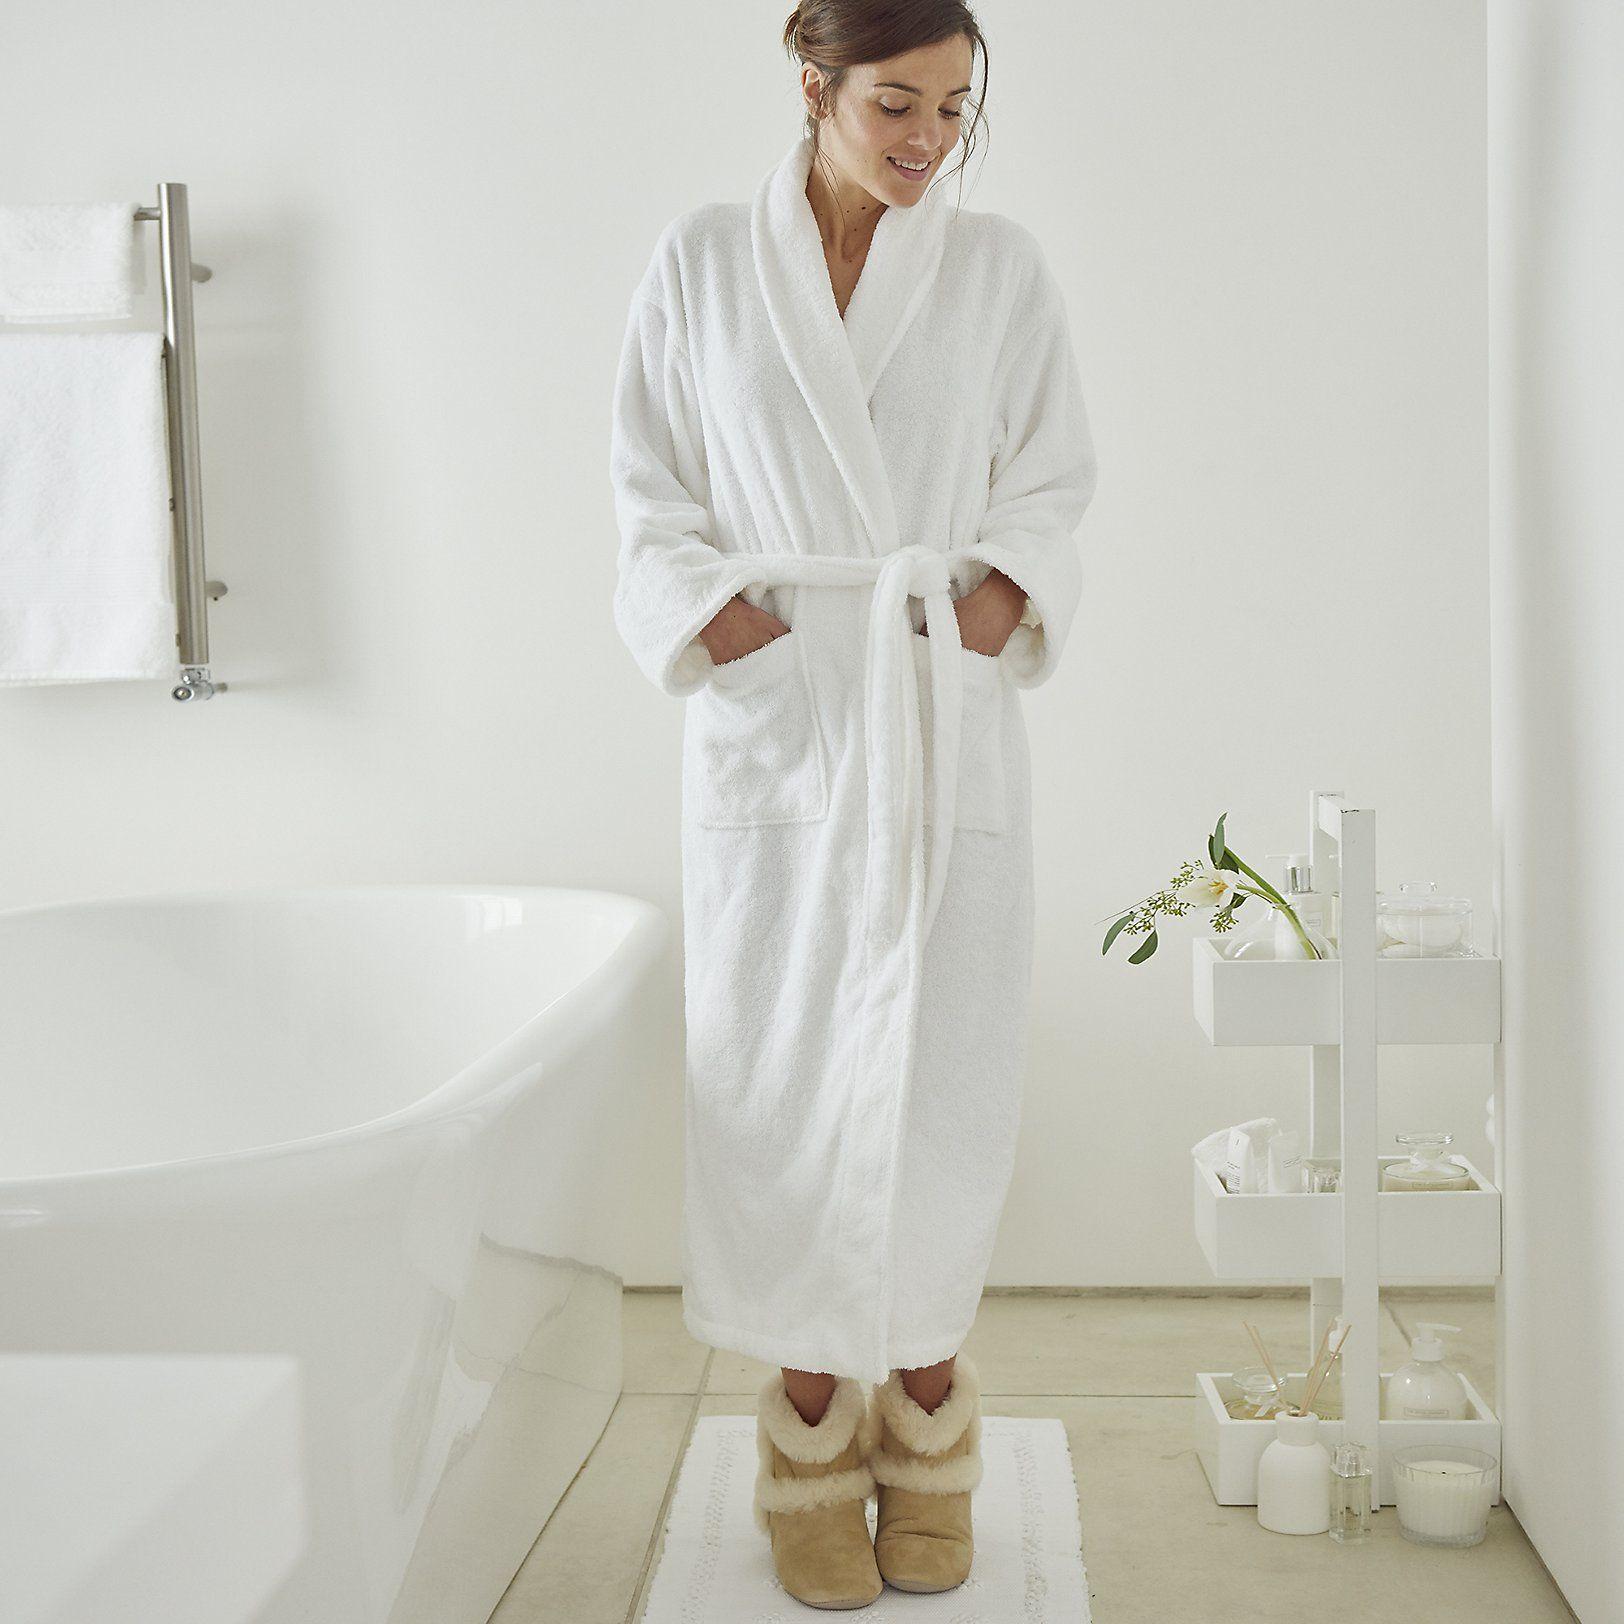 Unisex White Classic Robe | Robes & Slippers | Nightwear ...